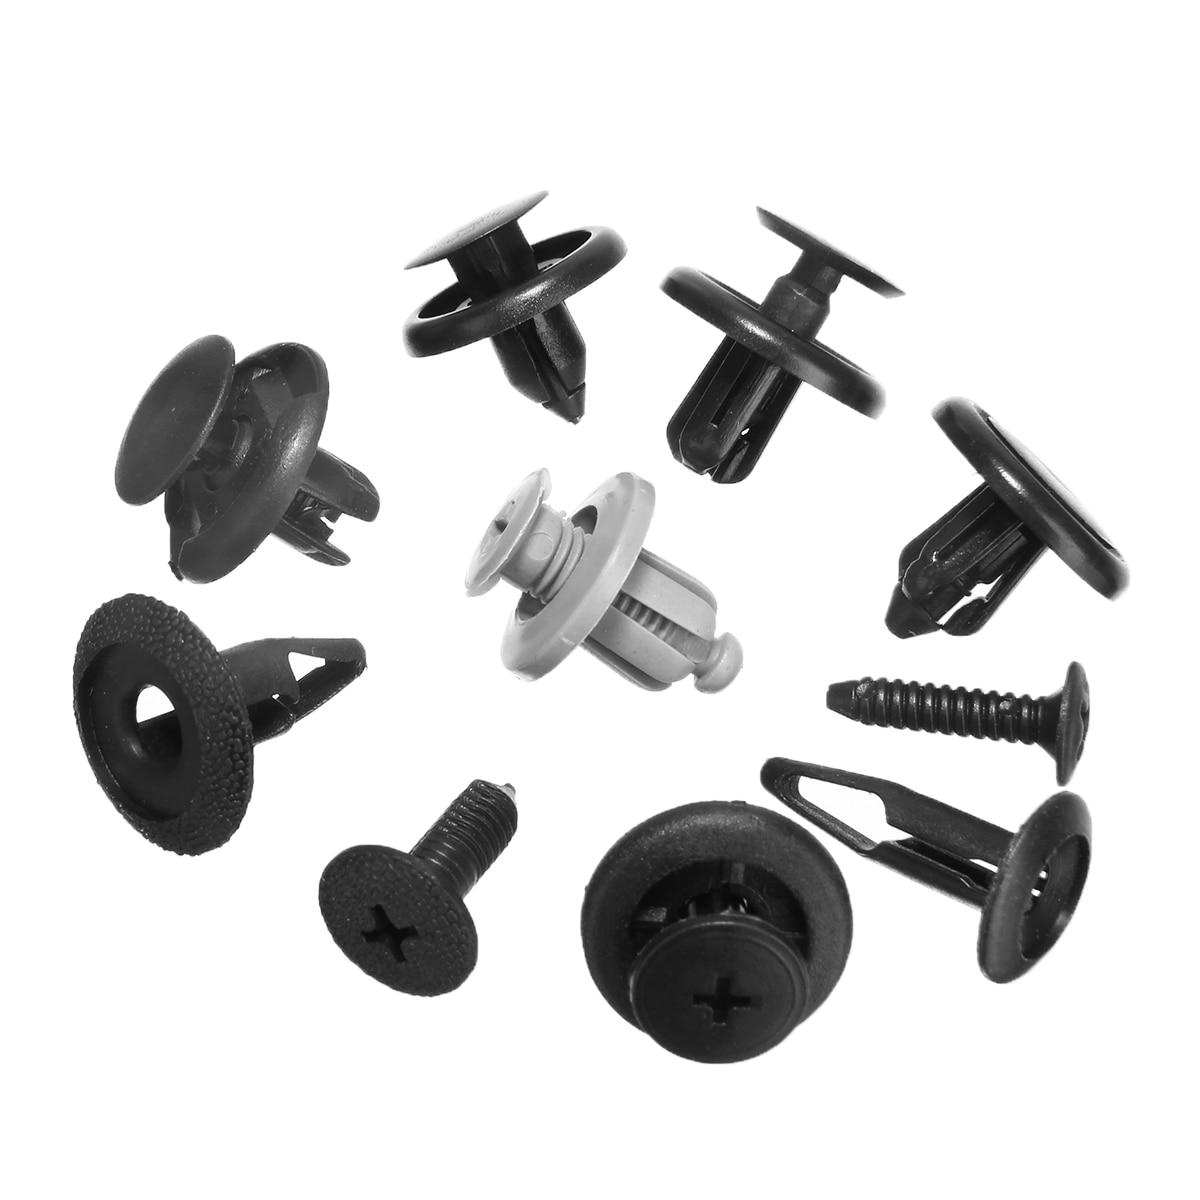 Mayitr New 100Pcs Mixed Fastener Clips Plastic Screw Rivet Clip Fastener Set For Car Trunk Bumper Fender